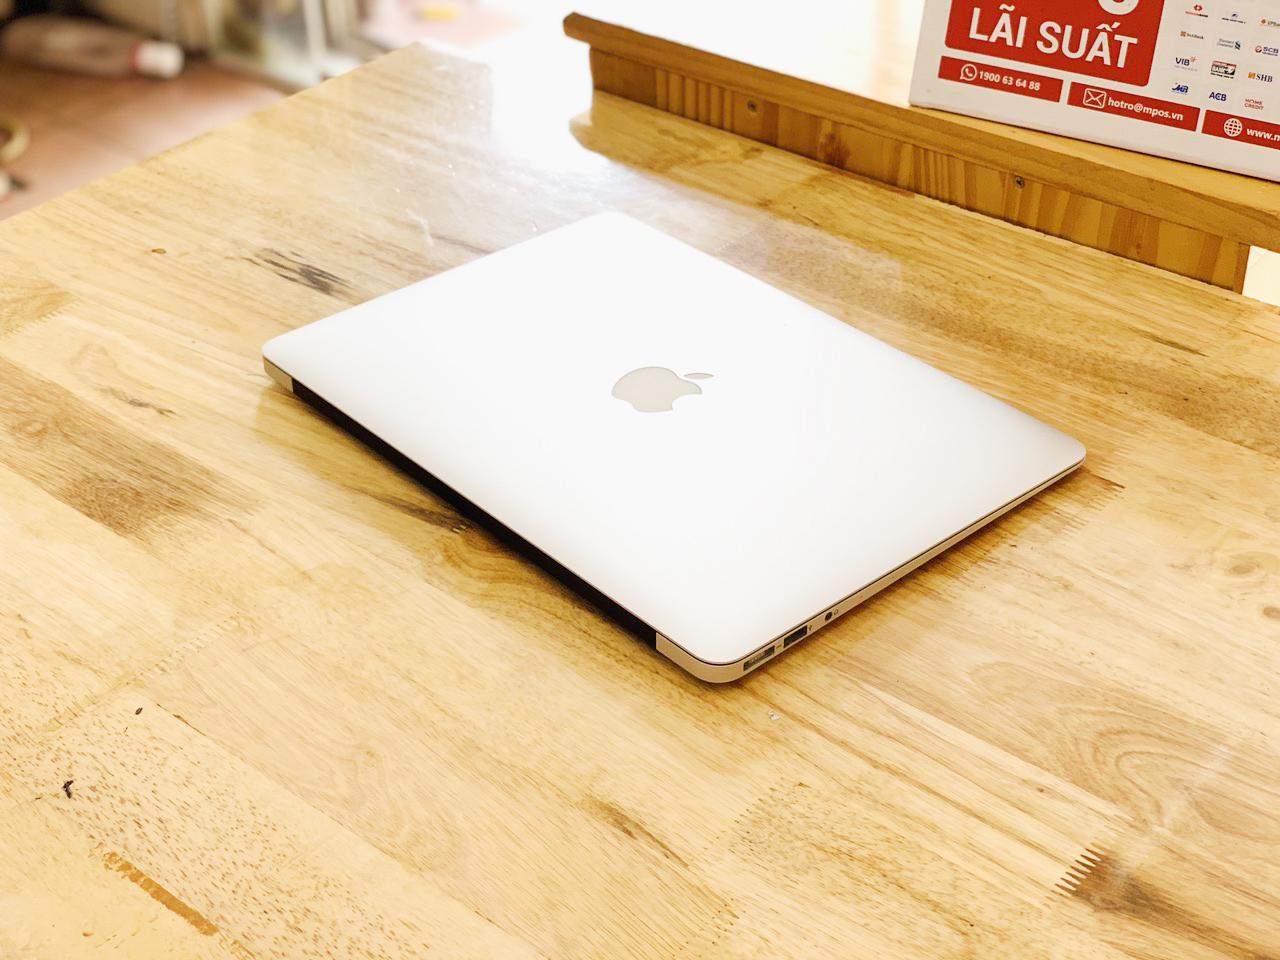 Macbook Air 13-inch,Mid 2012